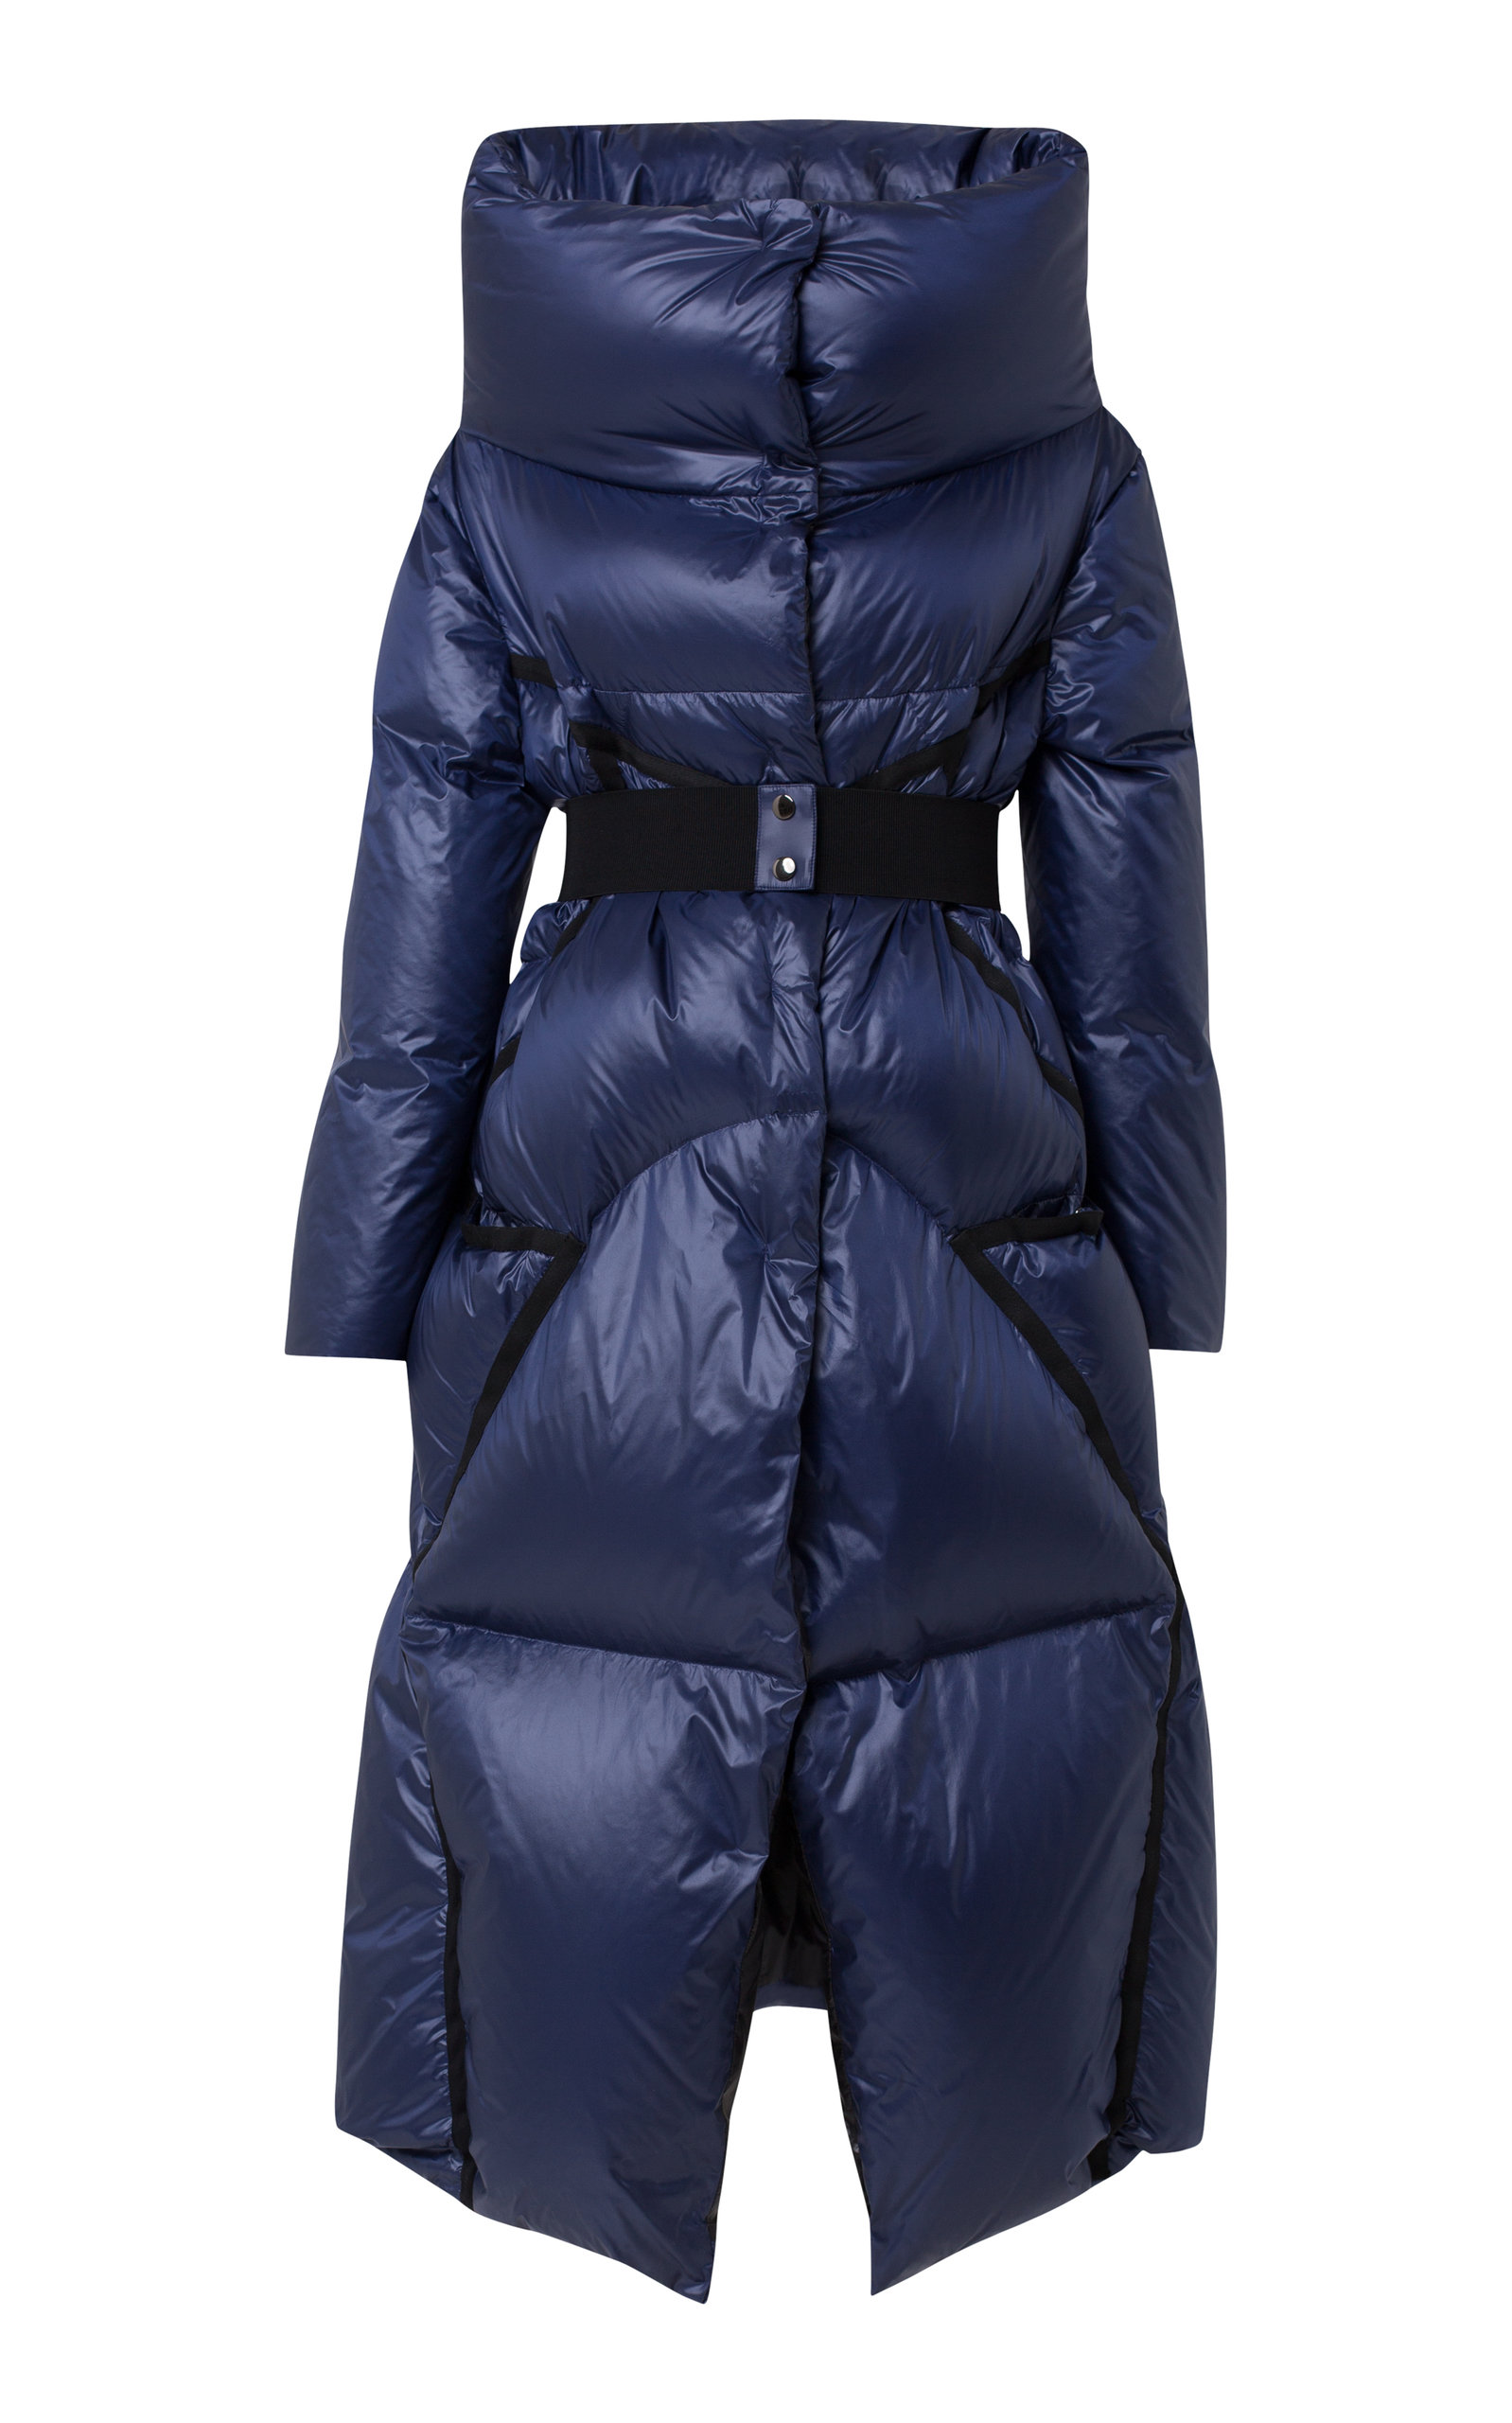 6c79eca0b Women's Clothing | Moda Operandi